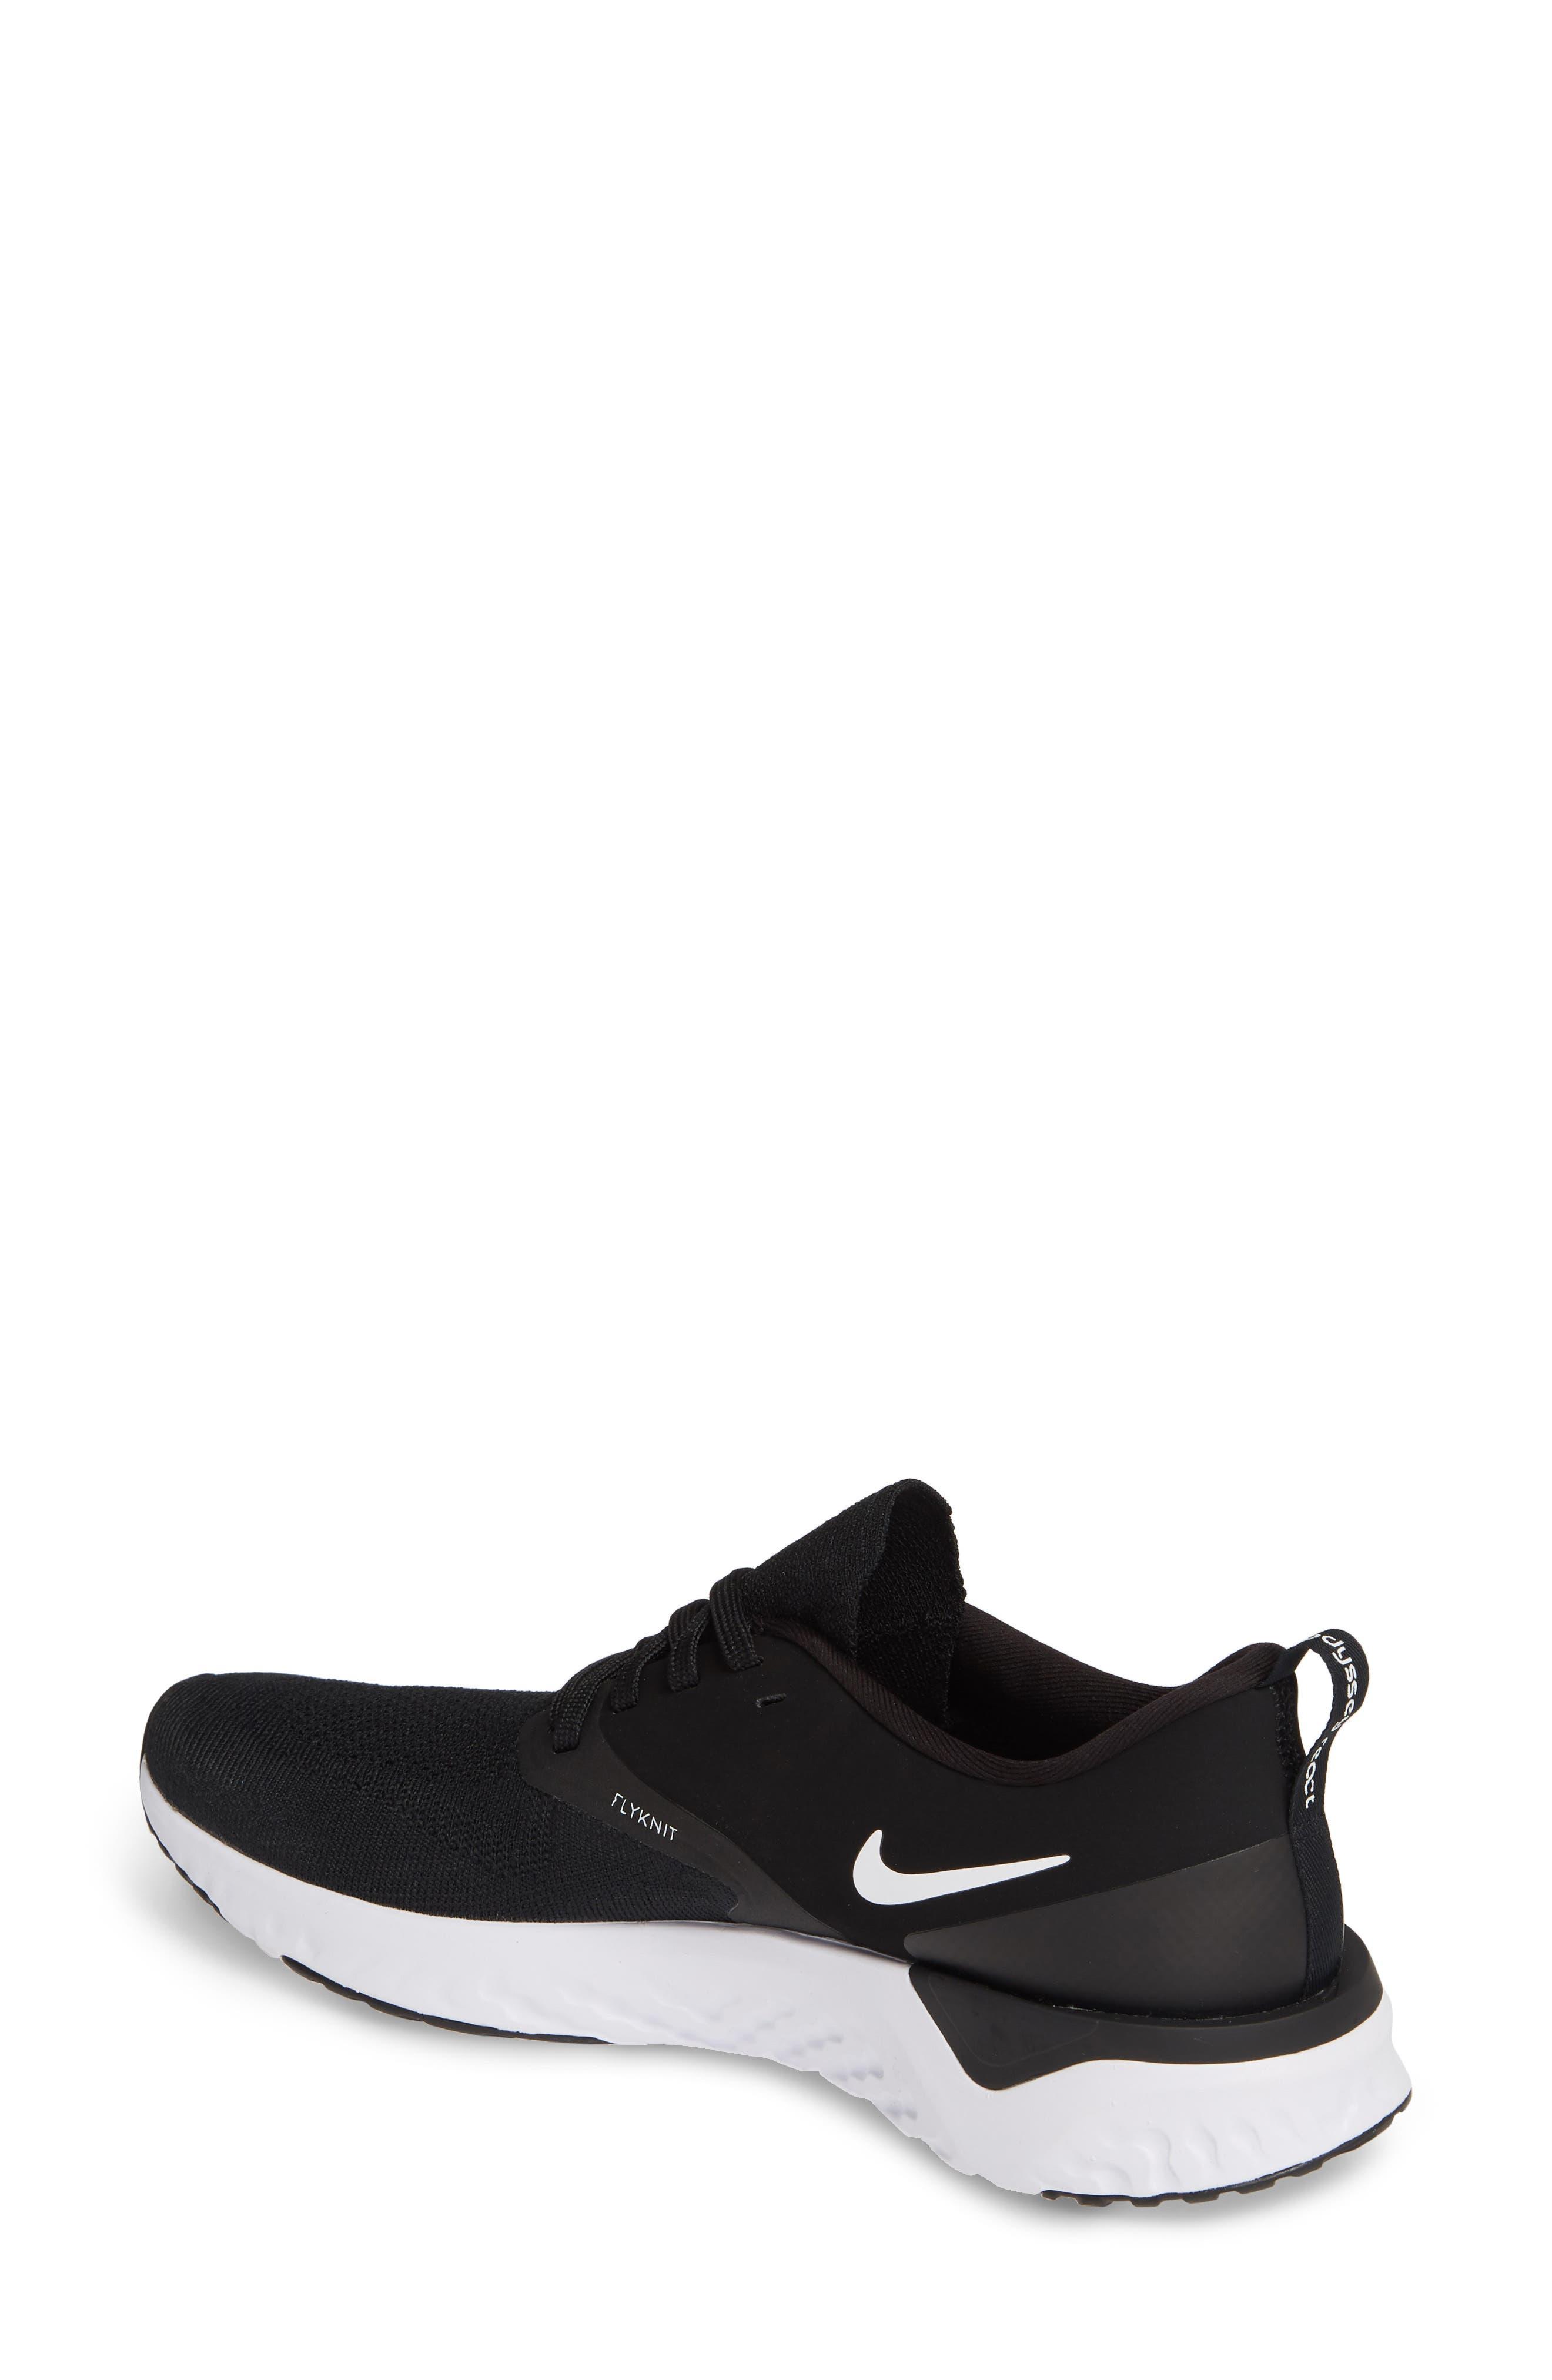 NIKE, Odyssey React 2 Flyknit Running Shoe, Alternate thumbnail 2, color, BLACK/ WHITE